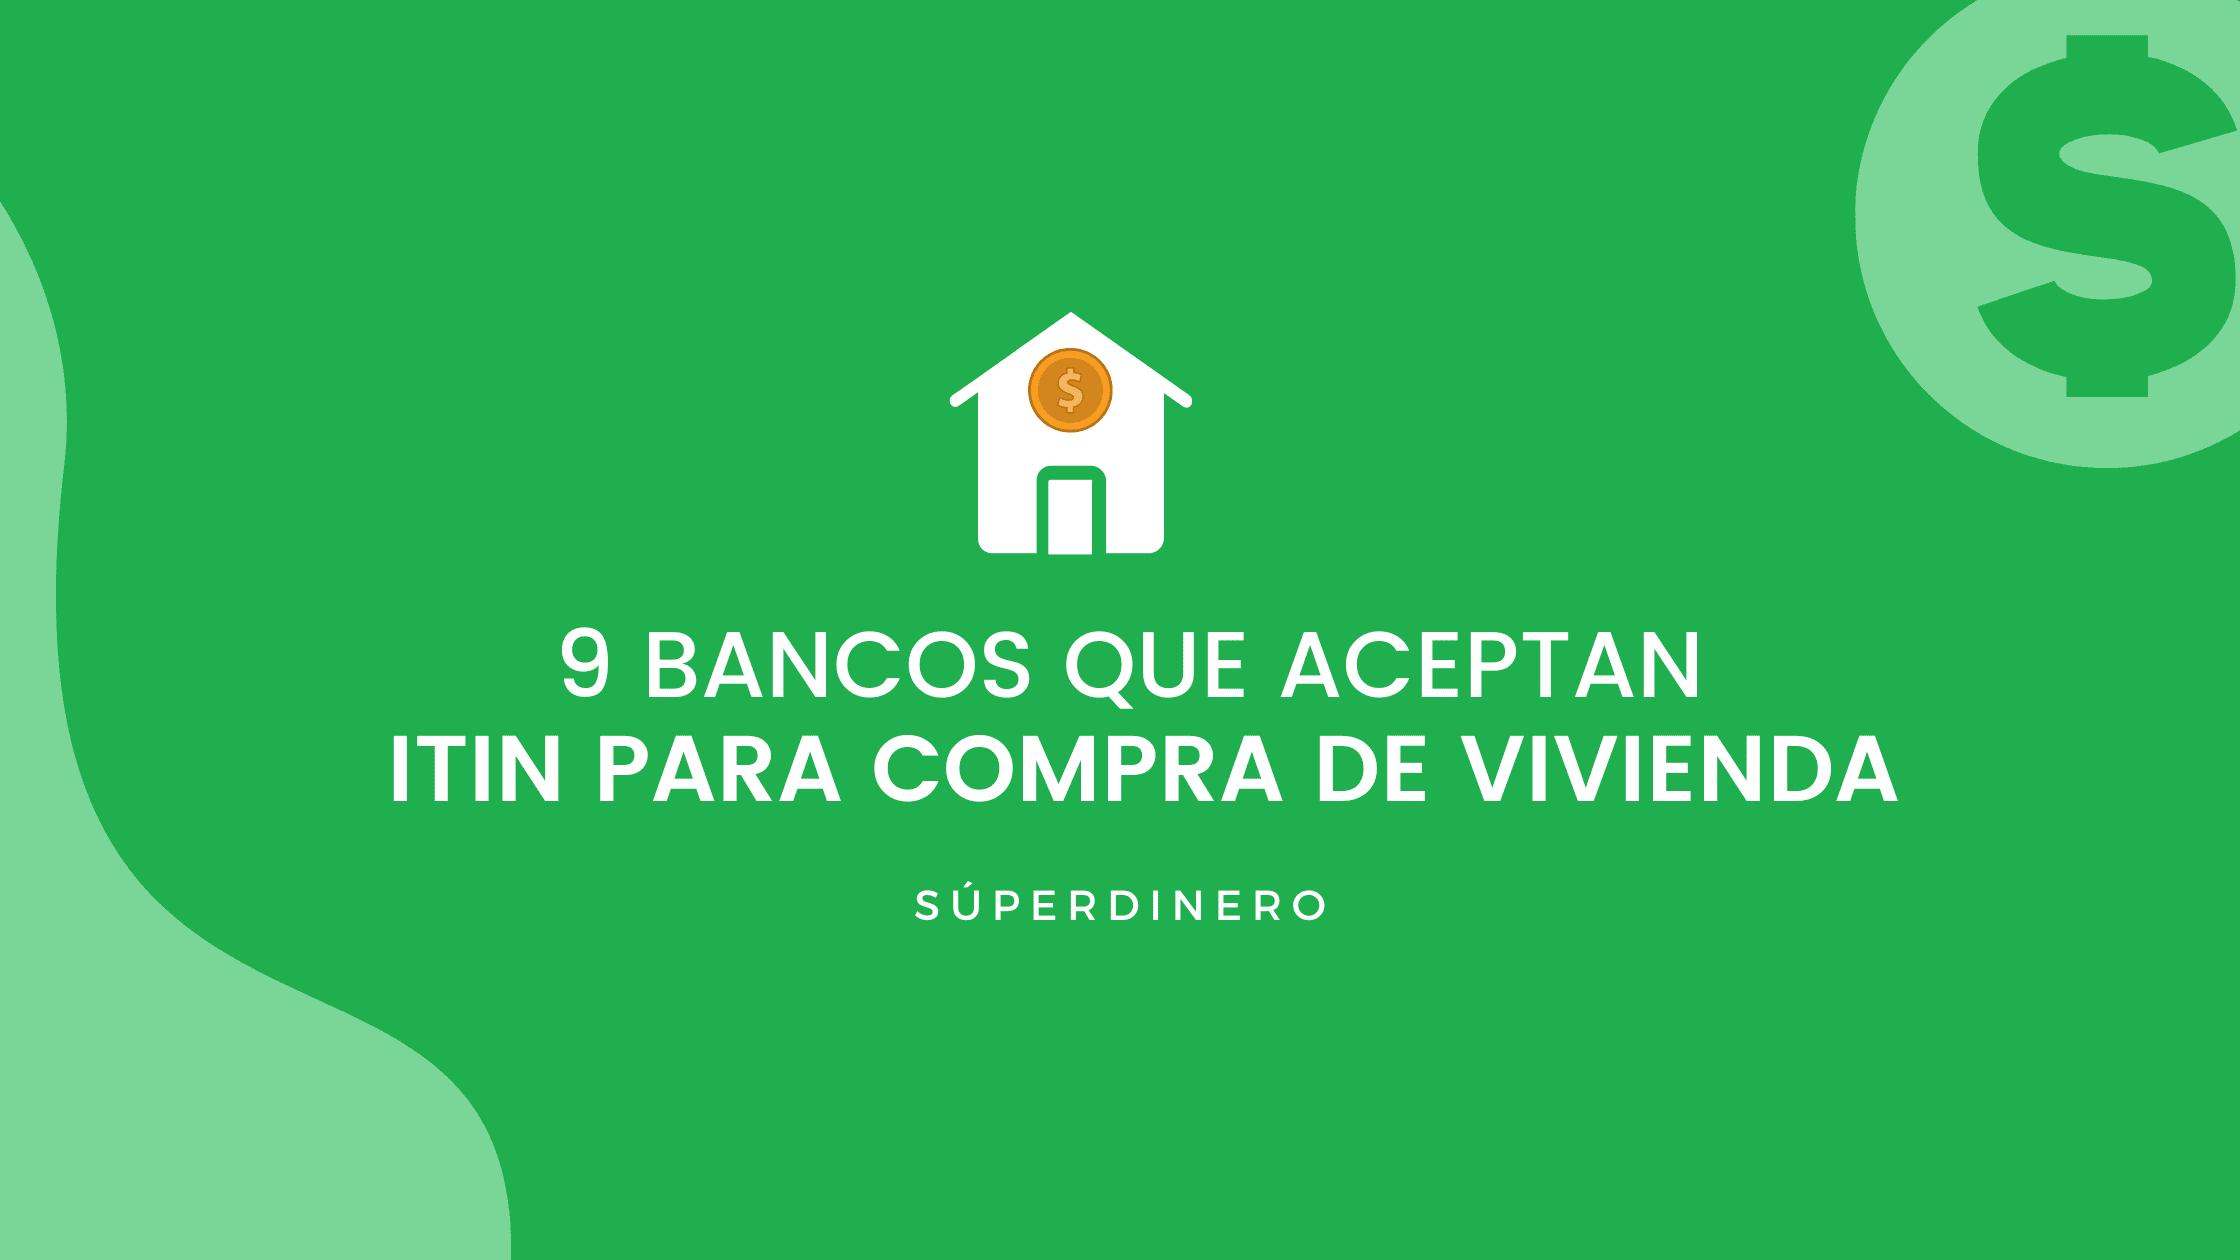 9 bancos que aceptan ITIN para comprar vivienda